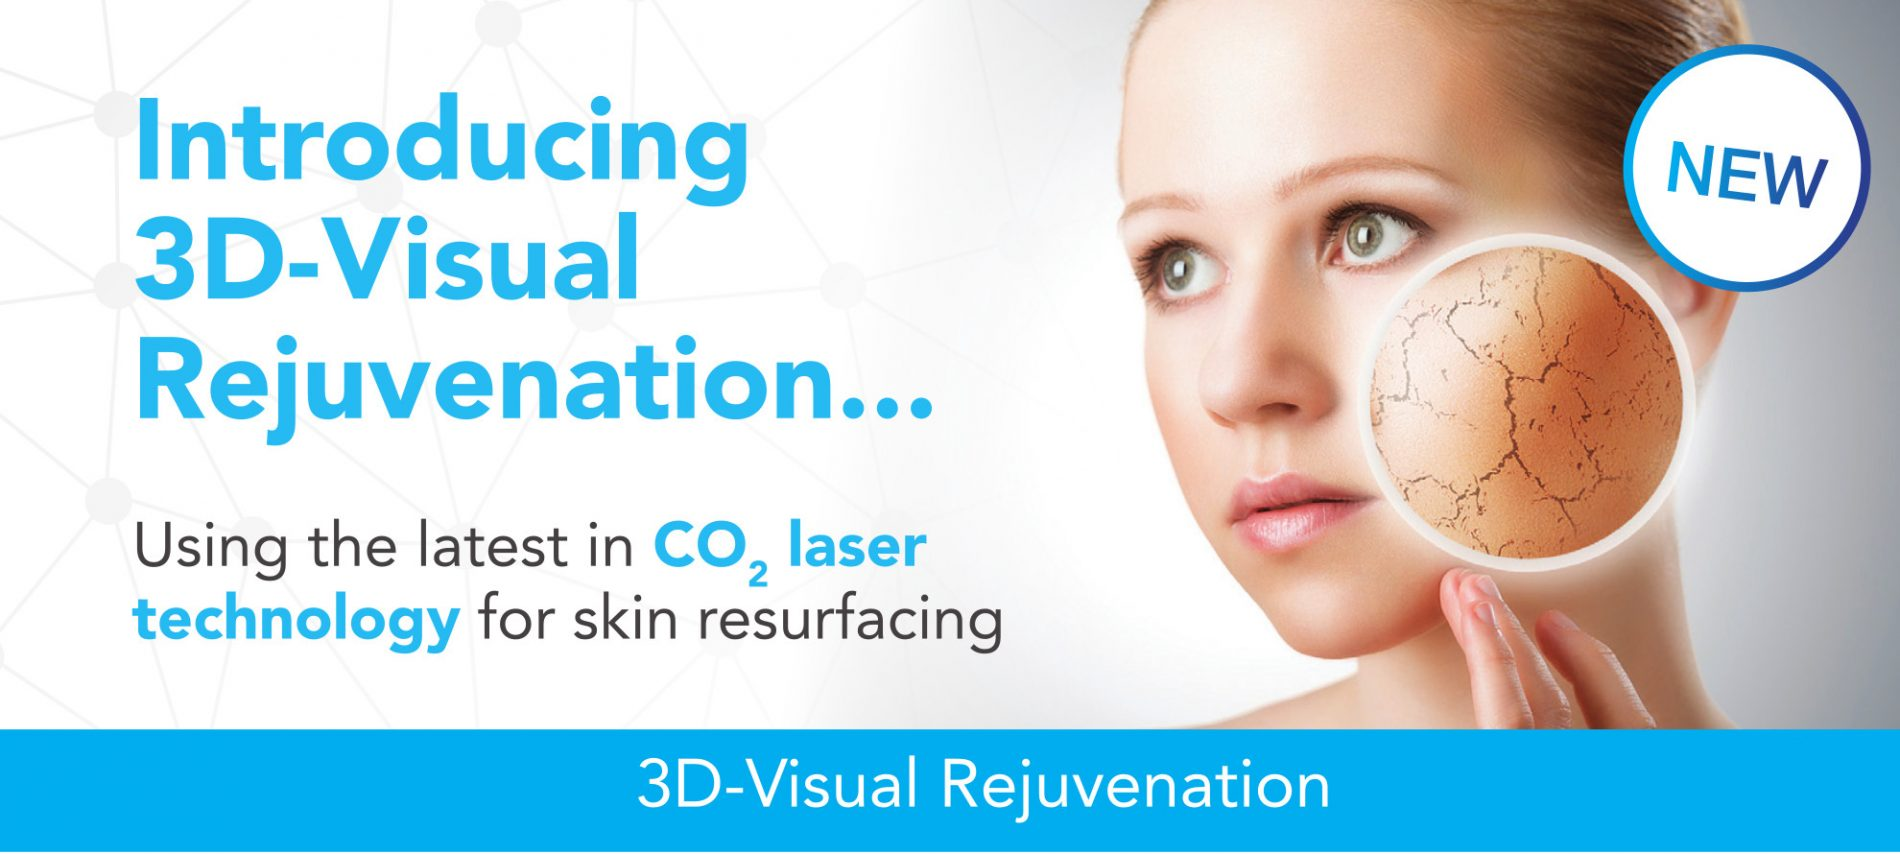 co2 3d visual rejuvenation